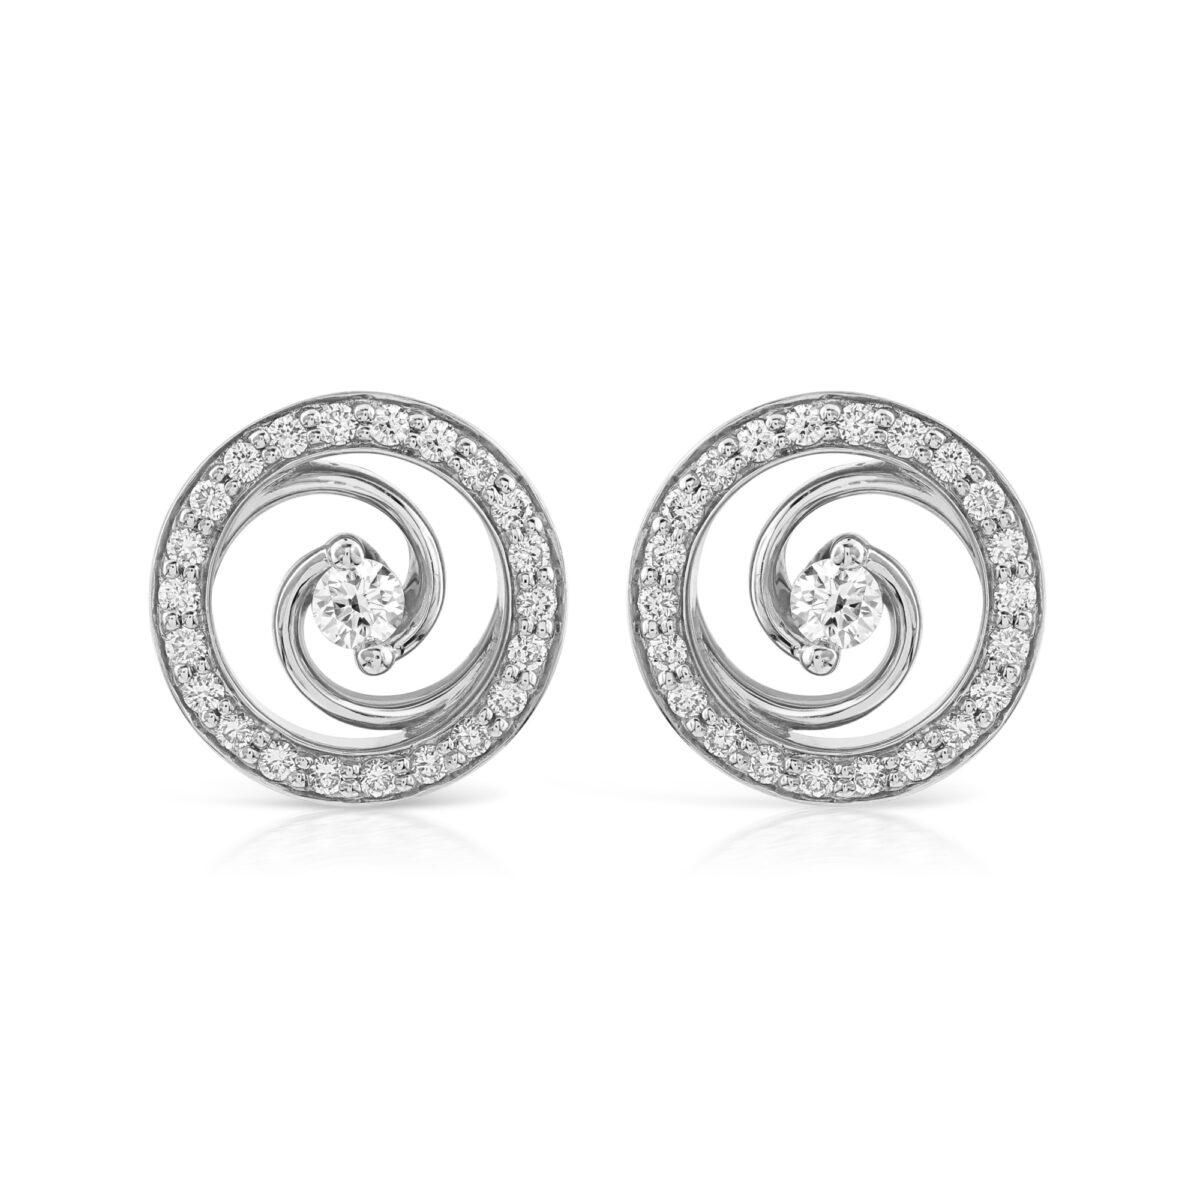 Whirlwind White Gold Diamond Stud Earrings